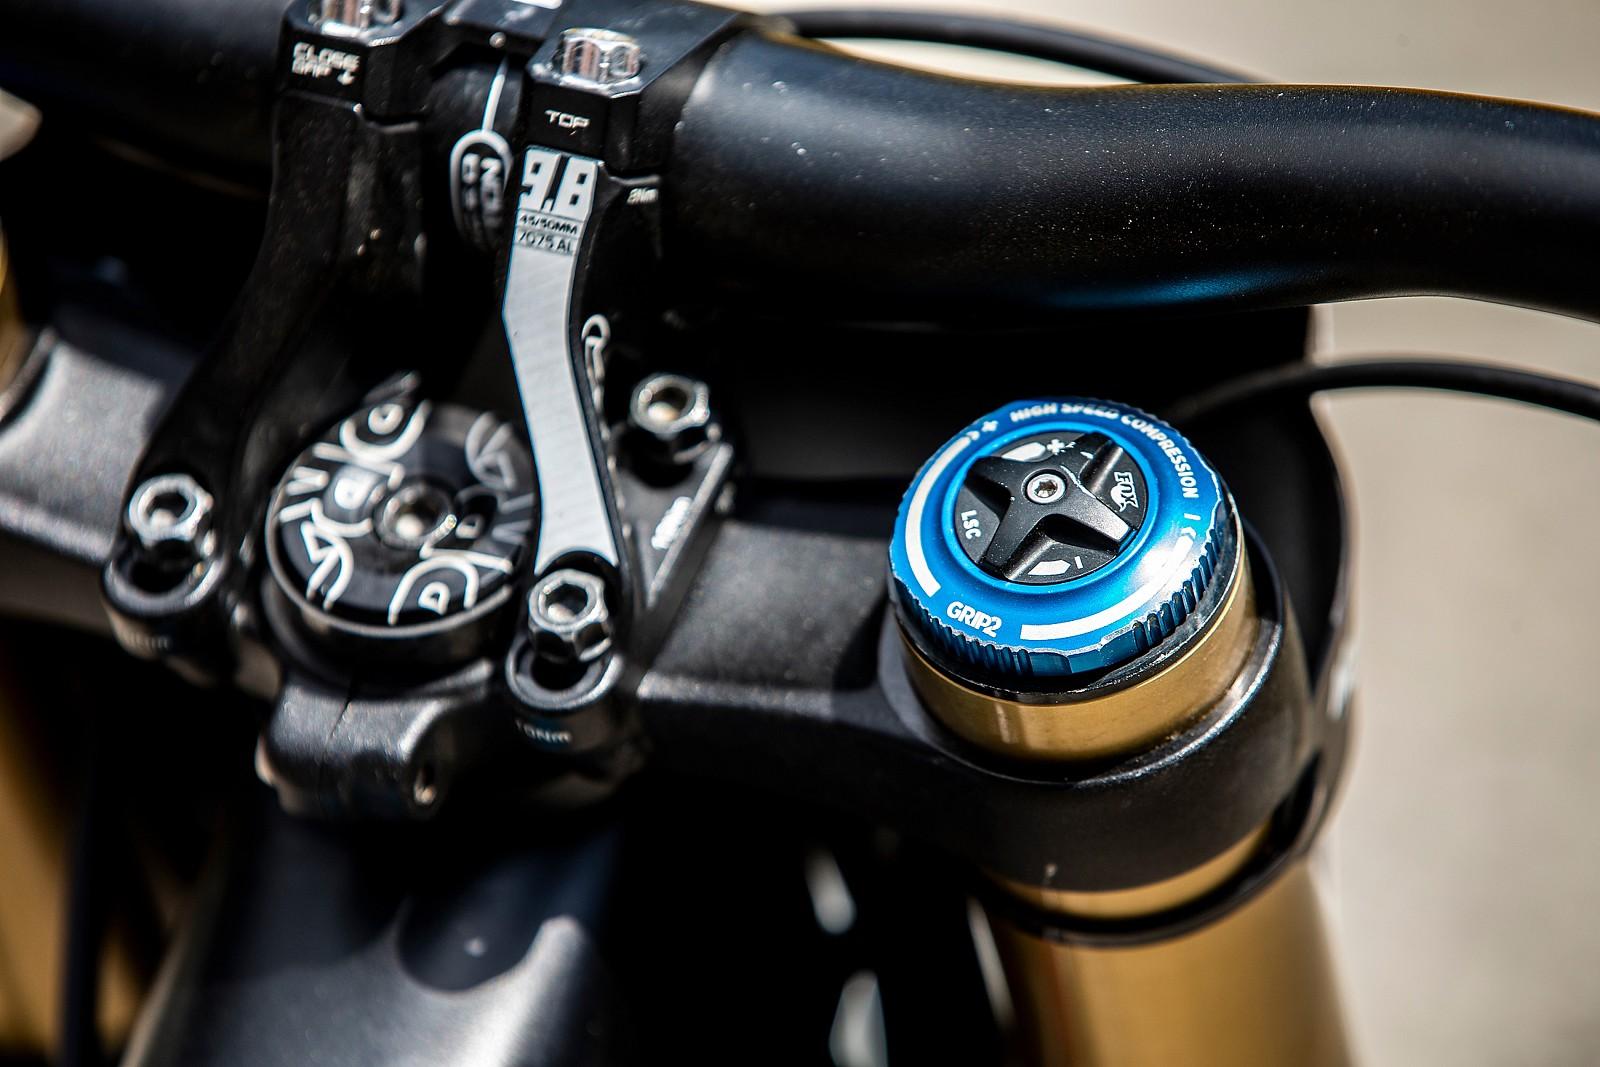 FOX Grip 2 Damper - WINNING BIKE - Tahnee Seagrave's Transition TR11 - Mountain Biking Pictures - Vital MTB